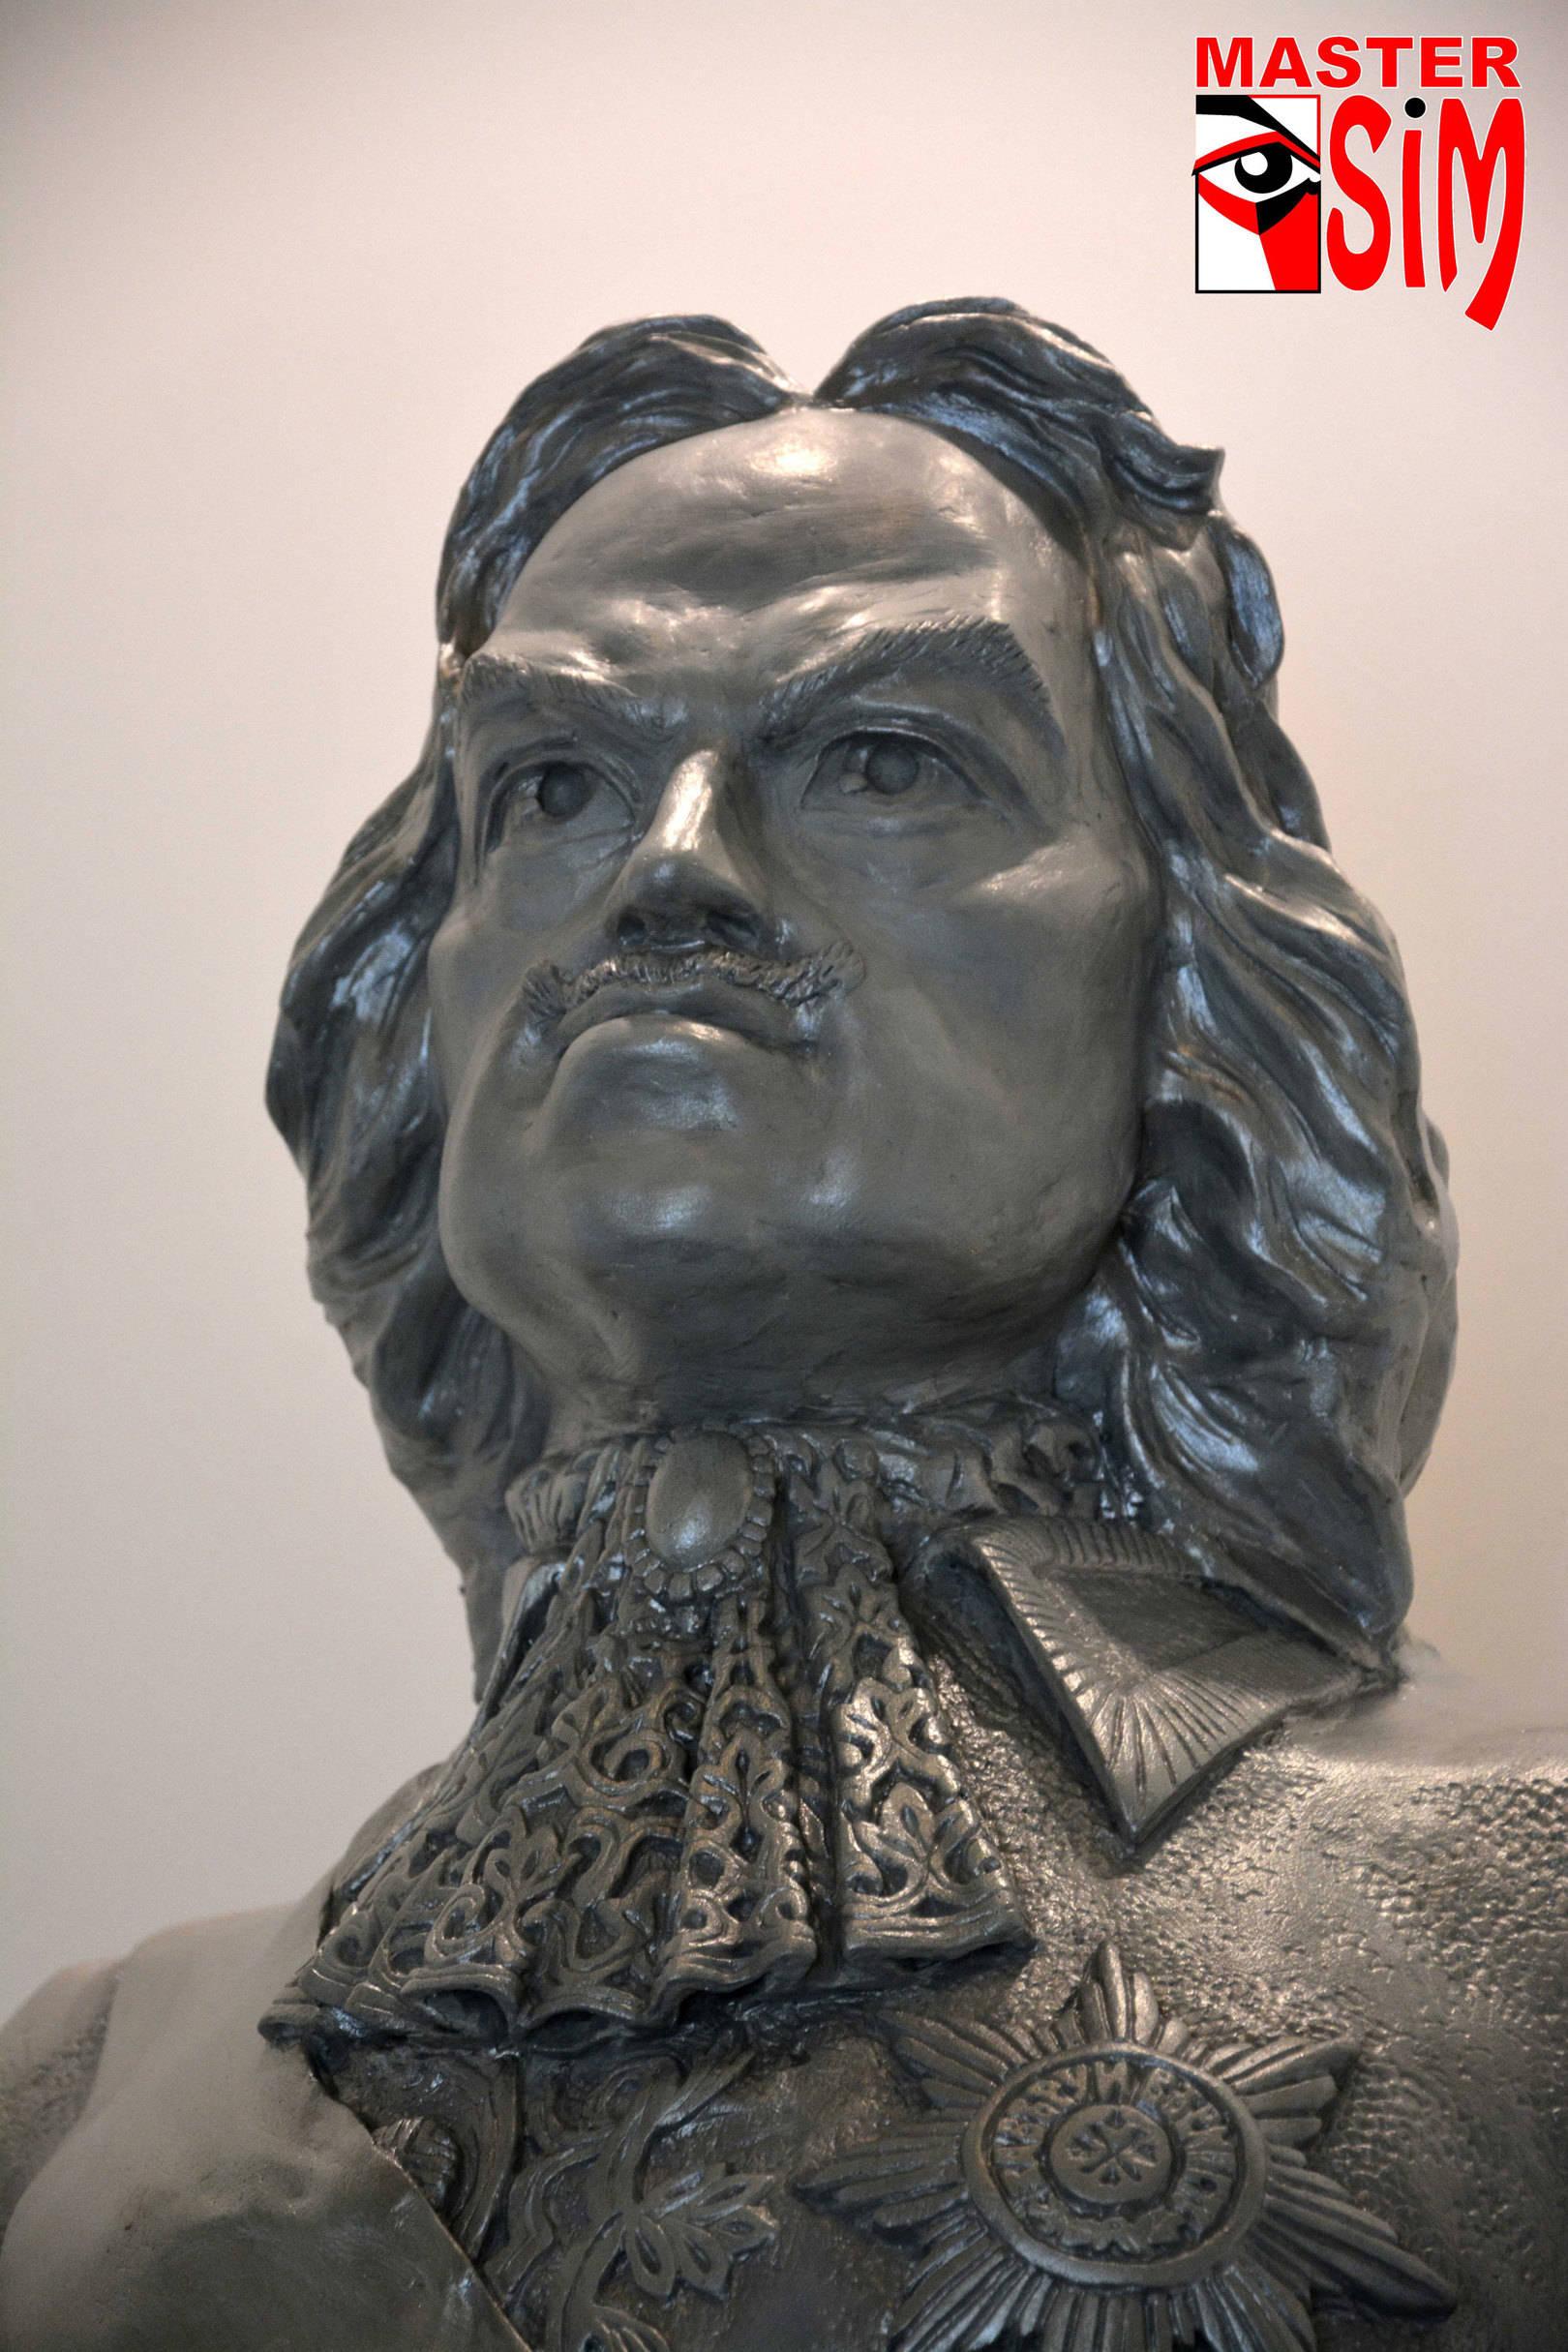 Закончил работу над Скульптурой Петр 1. Санкт Петербург.